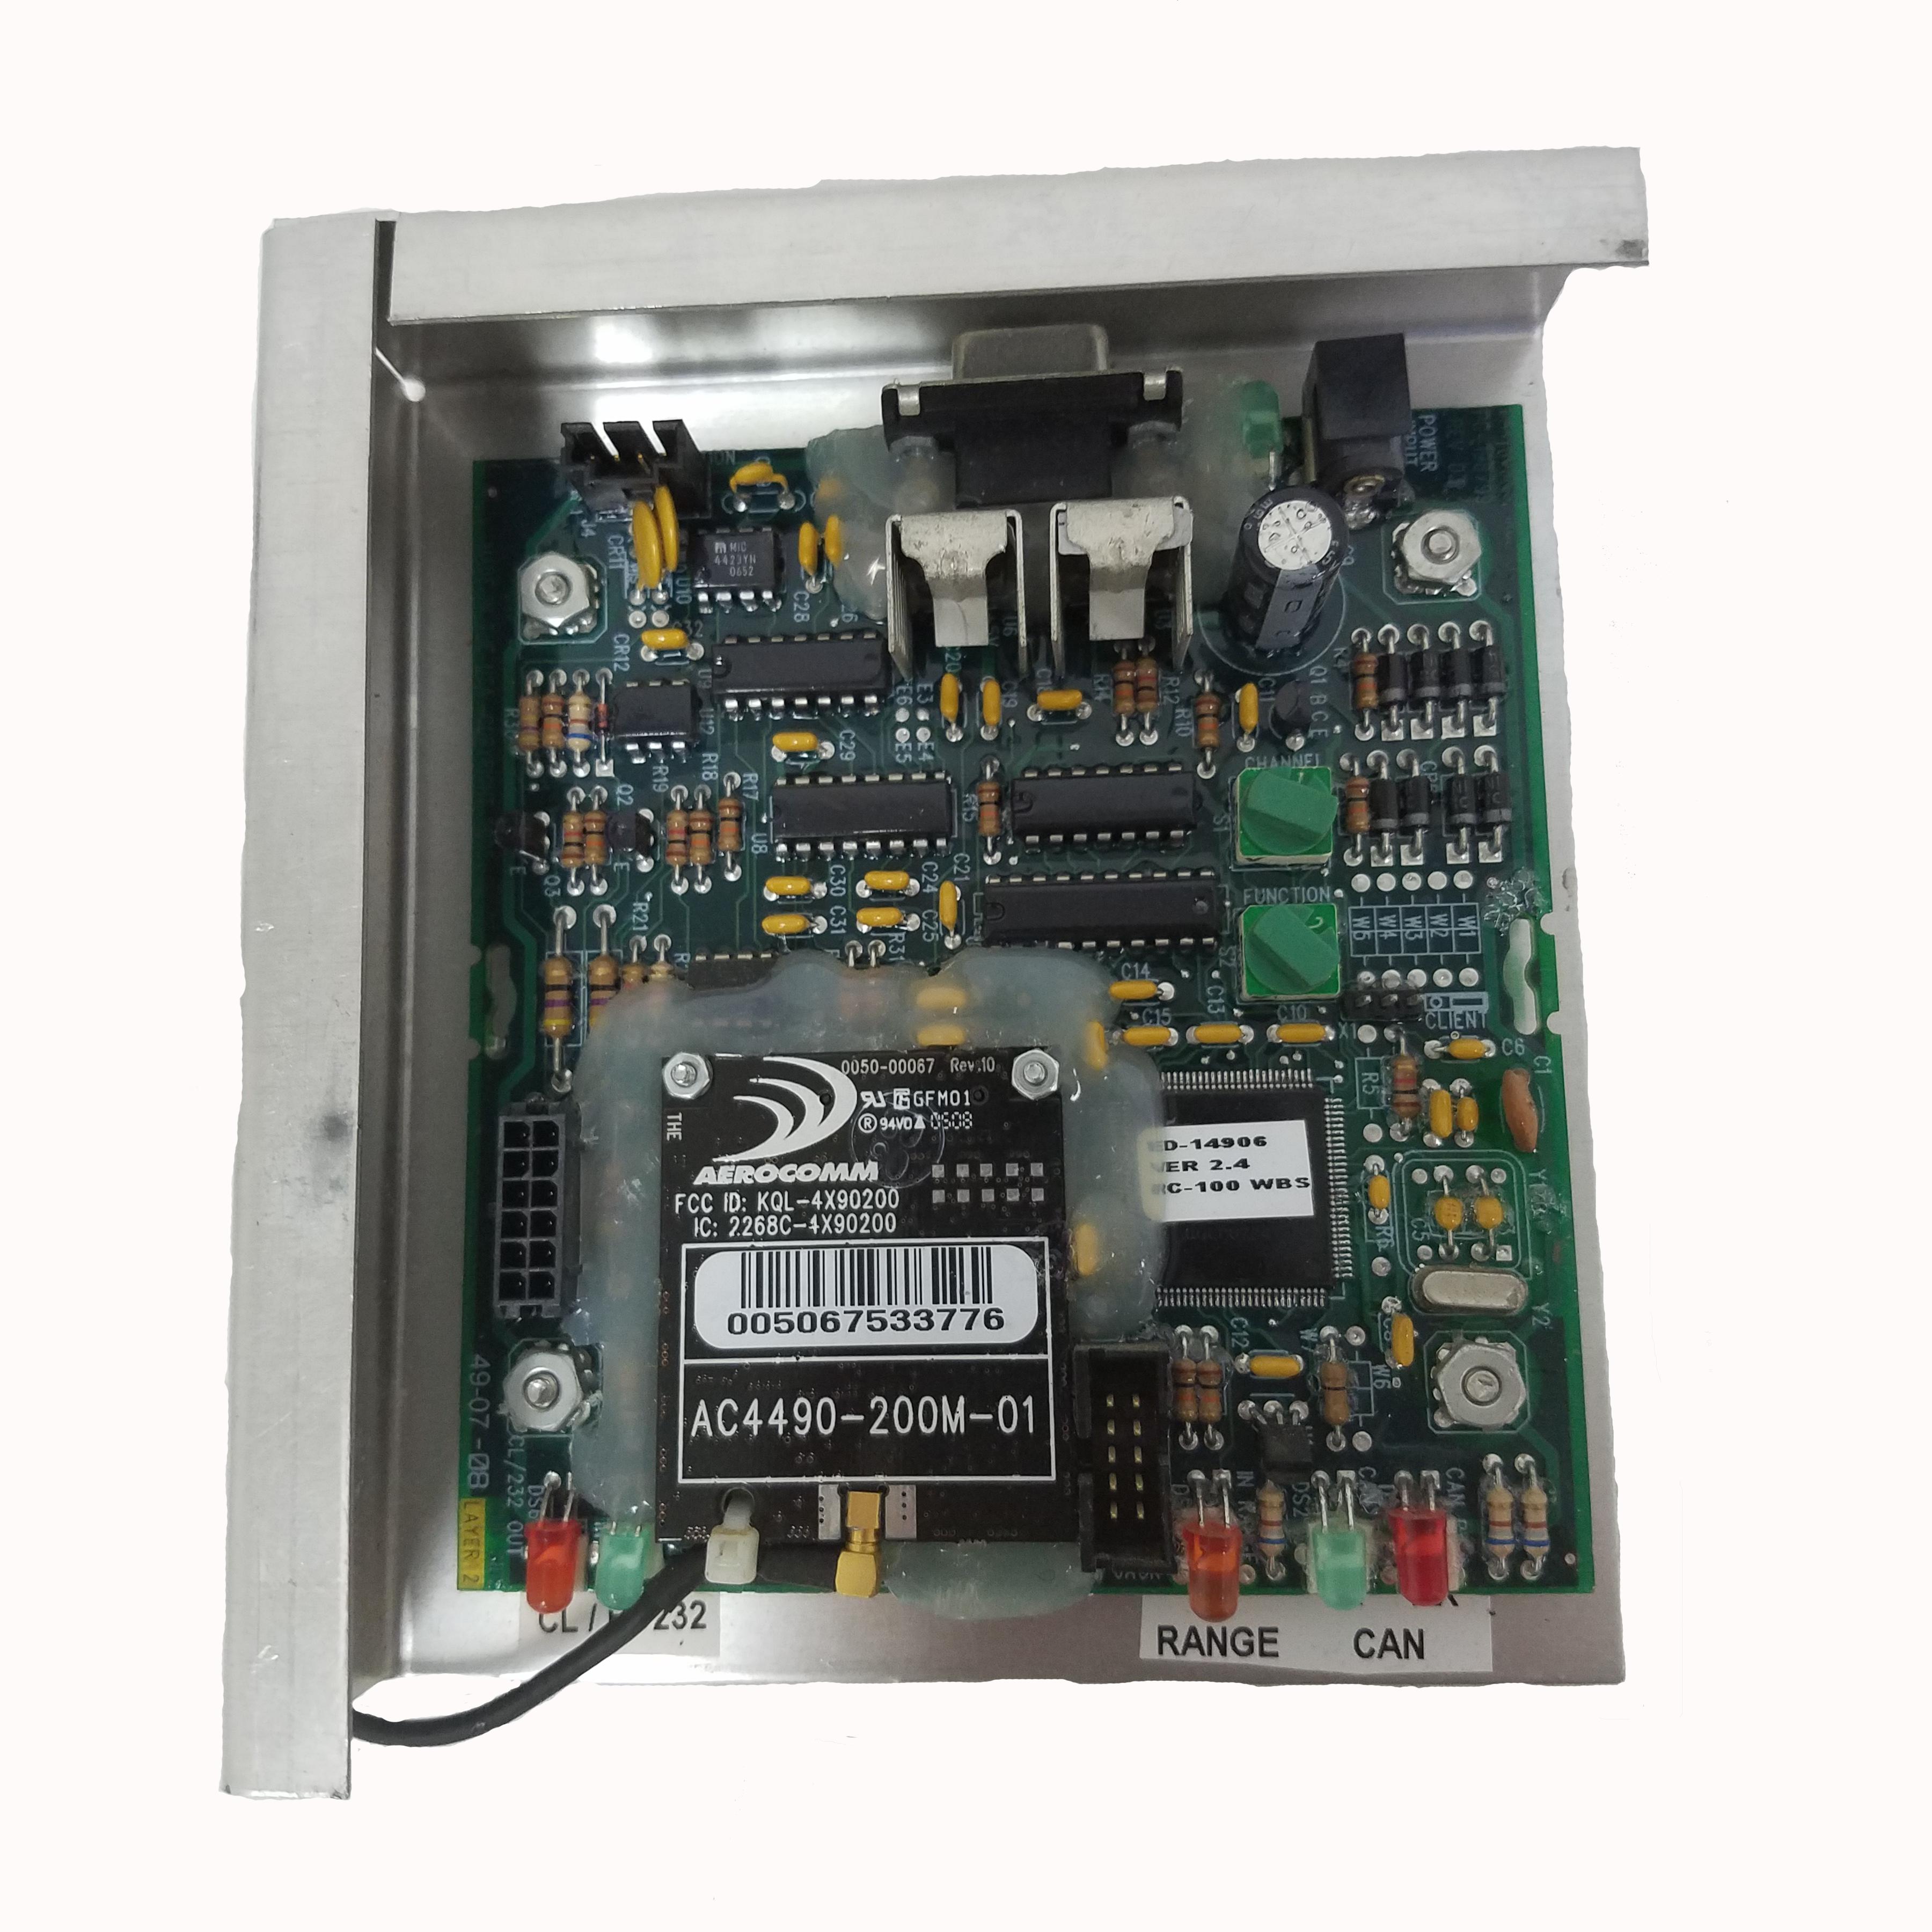 Daktronics Wireless Receiver Wire Center Am Microphone Circuit Diagram Tradeoficcom 0a 1110 0135 Rc 100 Base Station New Rh Dc Digital Com